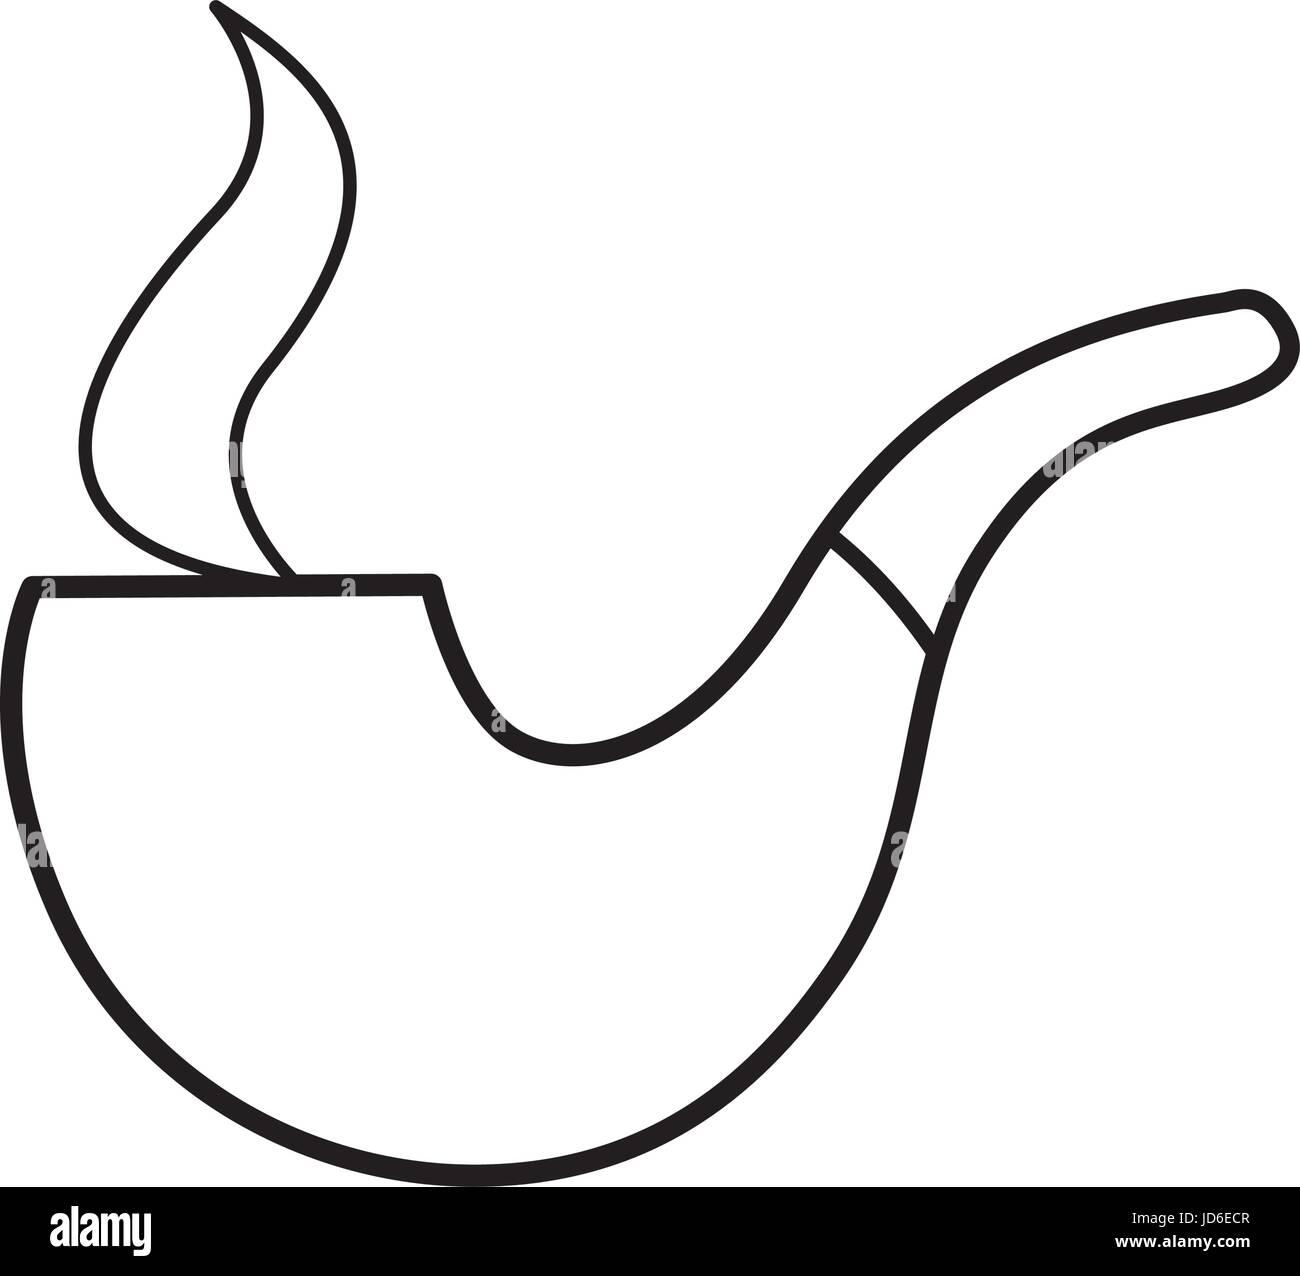 Smoke Line Illustration Imágenes De Stock & Smoke Line Illustration ...